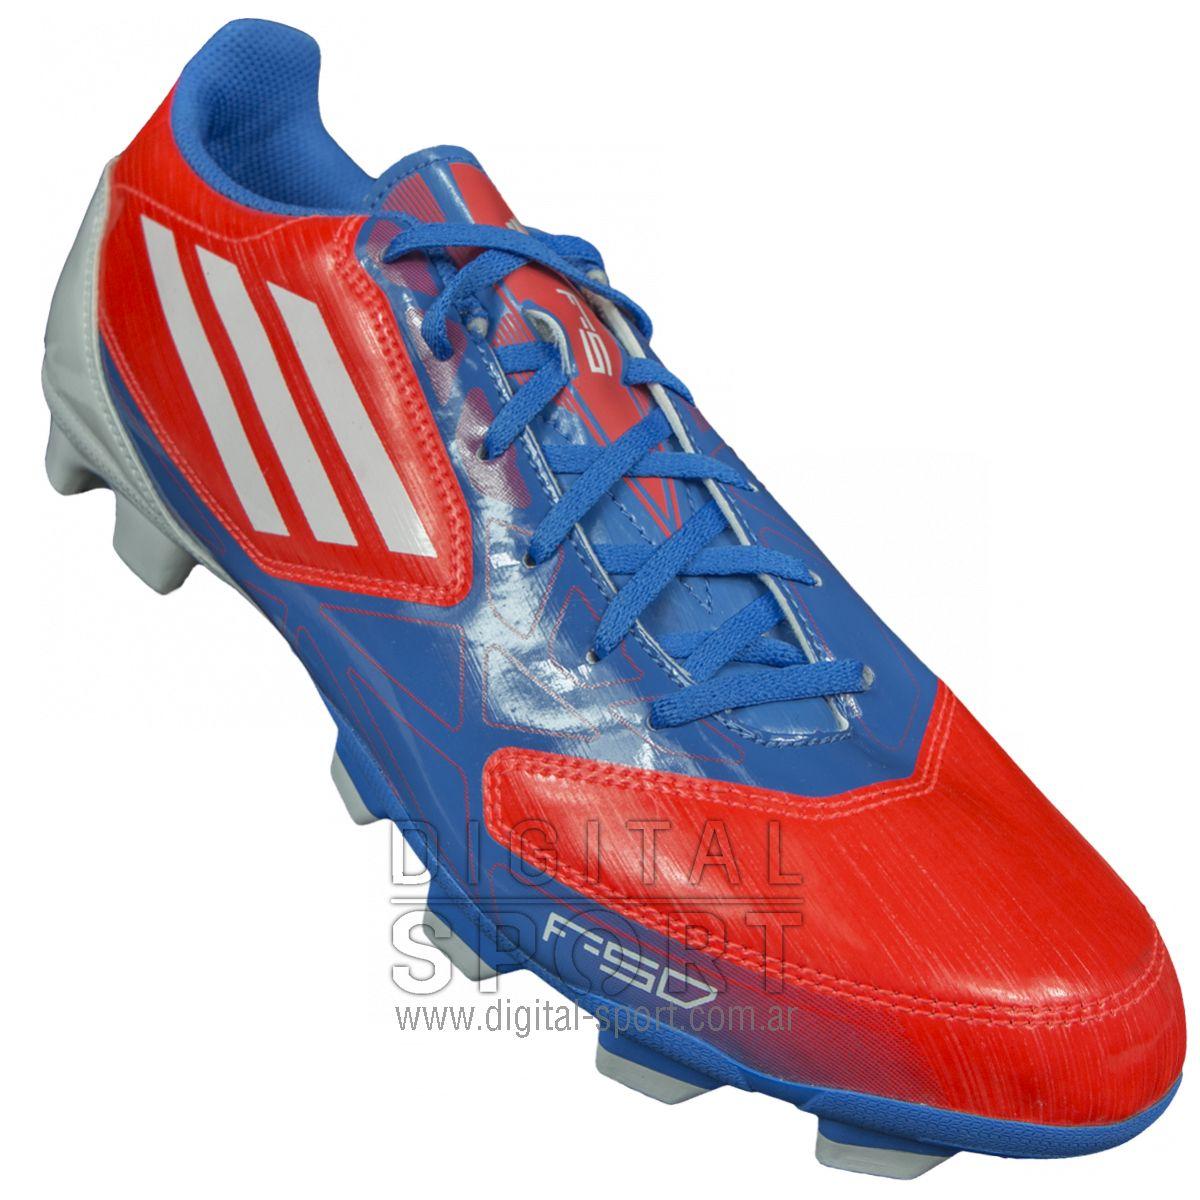 Adidas hombre futbol digitalsport digital sport compra venta online rosario  argentina deportes jpg 1200x1200 Adidas botines 035514d2a065a